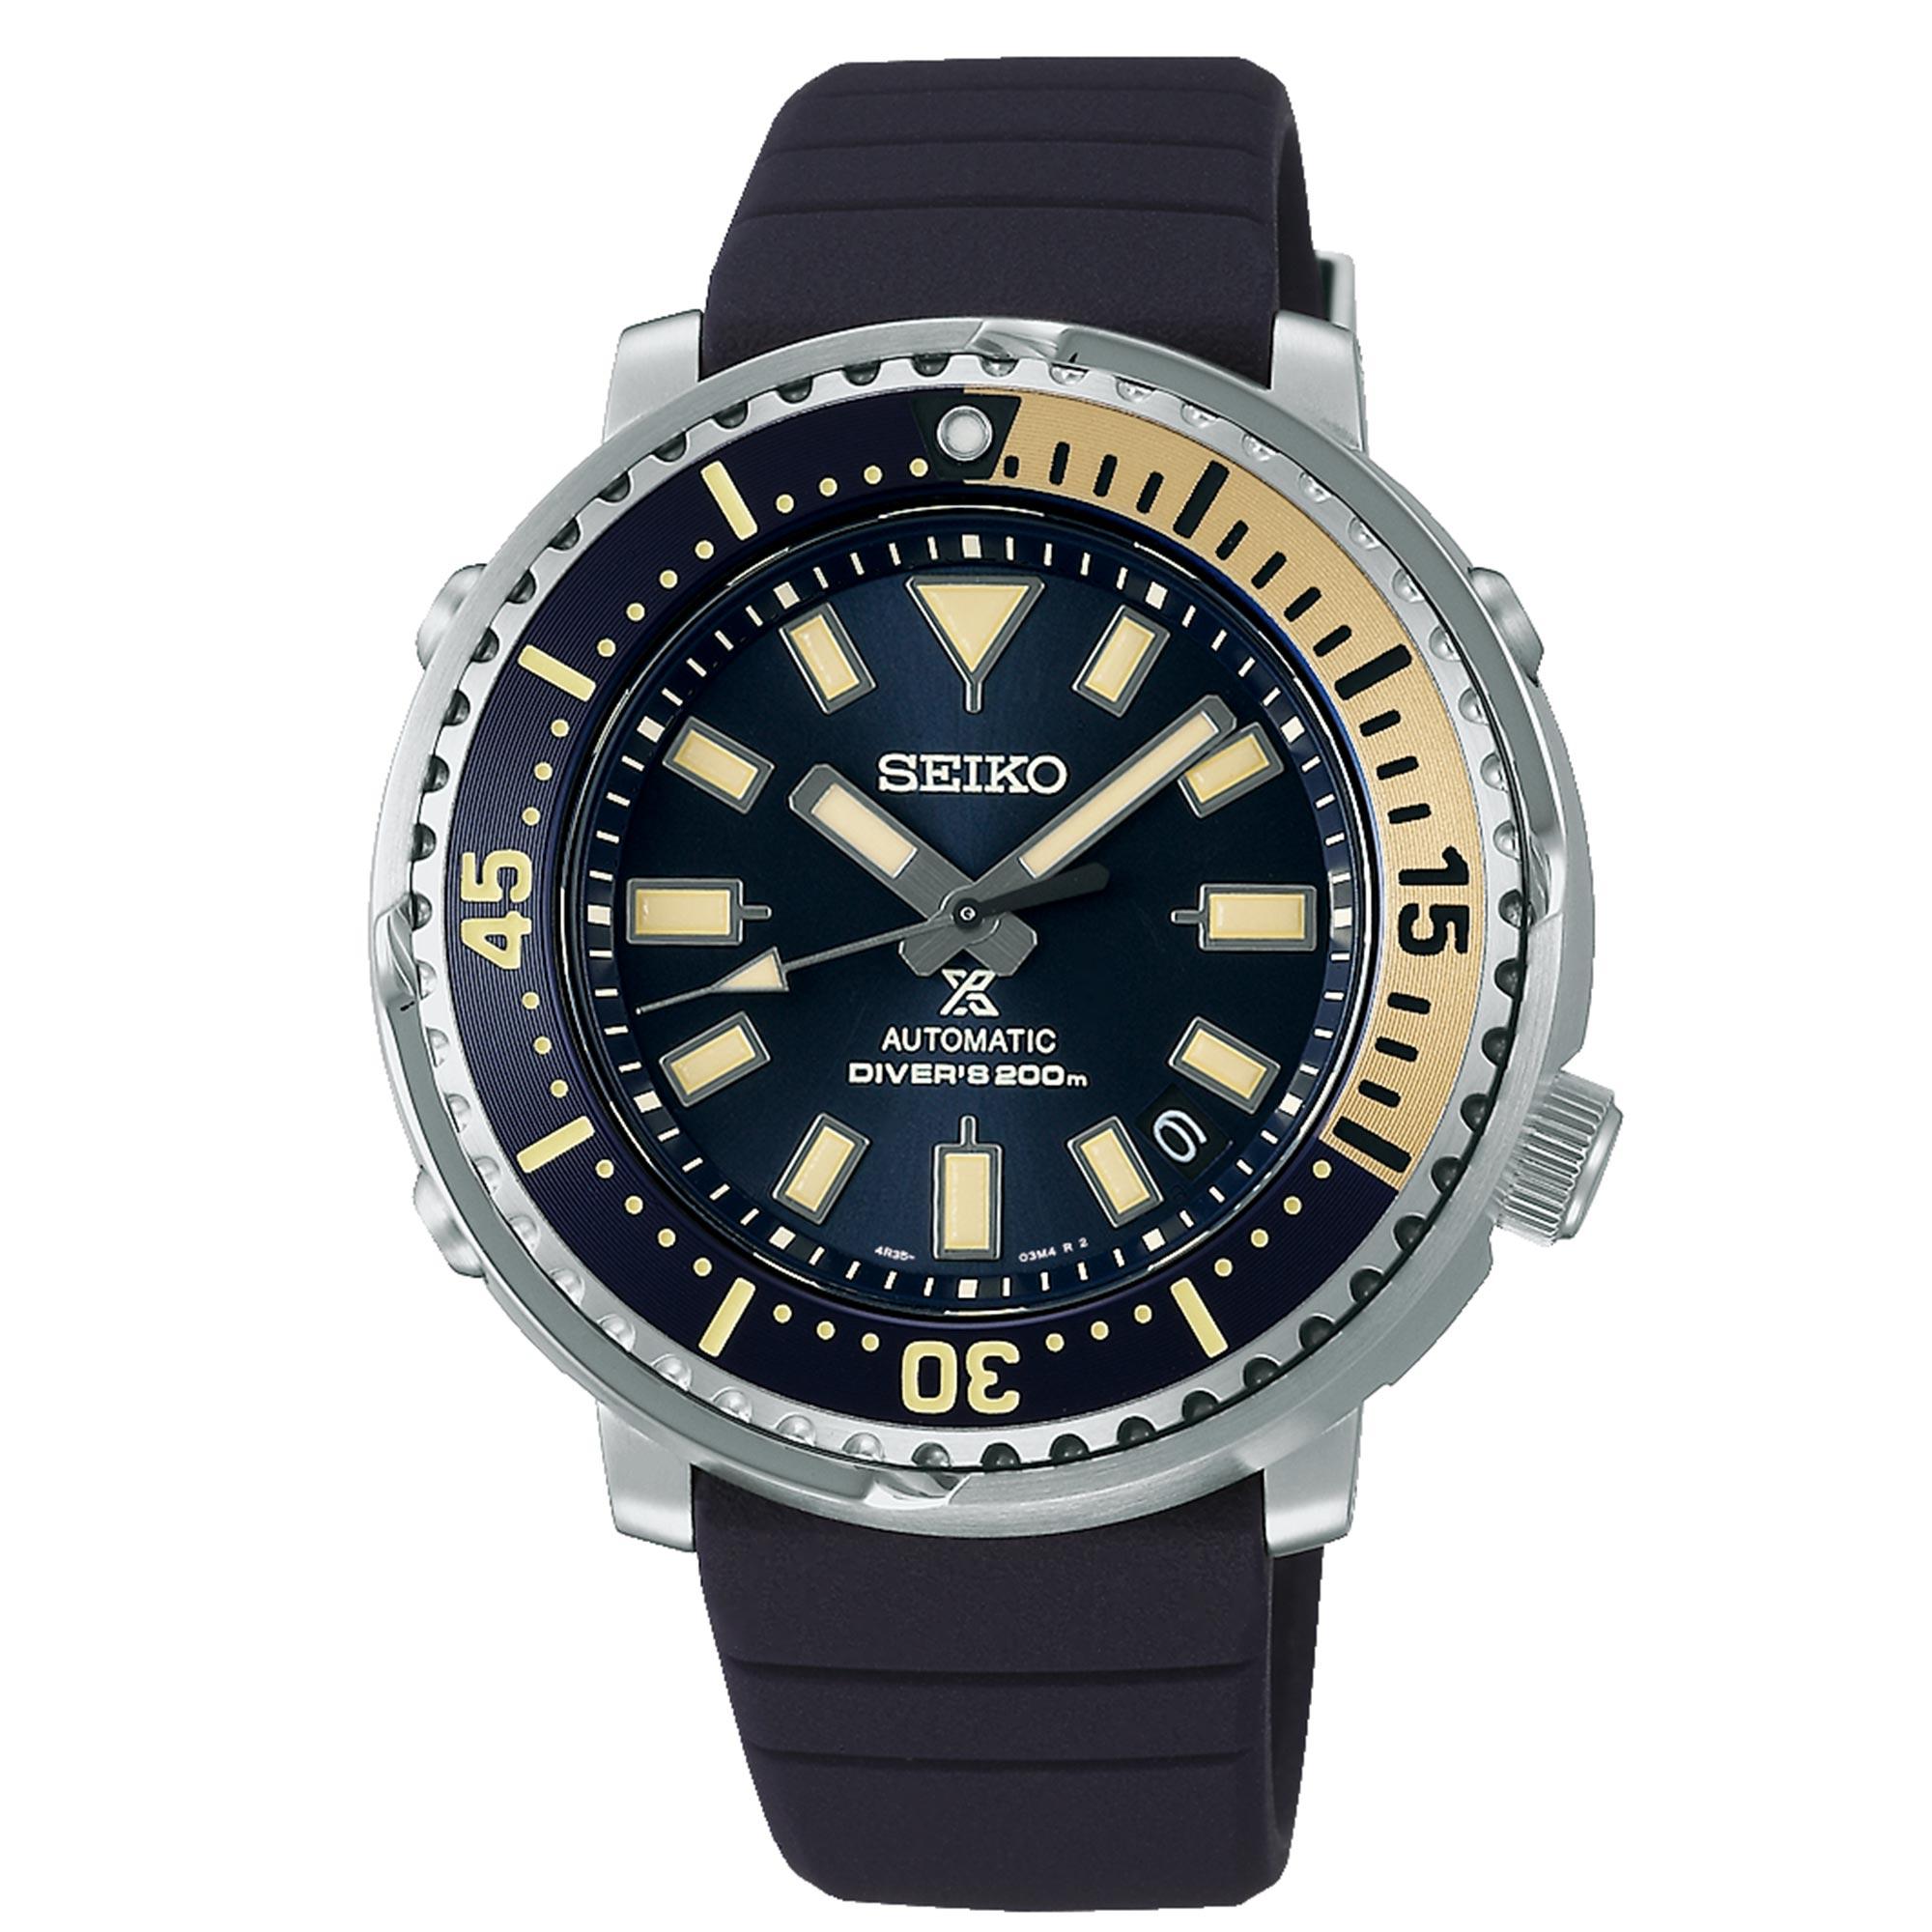 Seiko Prospex Street Series 'Tuna' Safari Edition Automatic Blue Dial Silicone Strap Men's Watch SRPF81K1